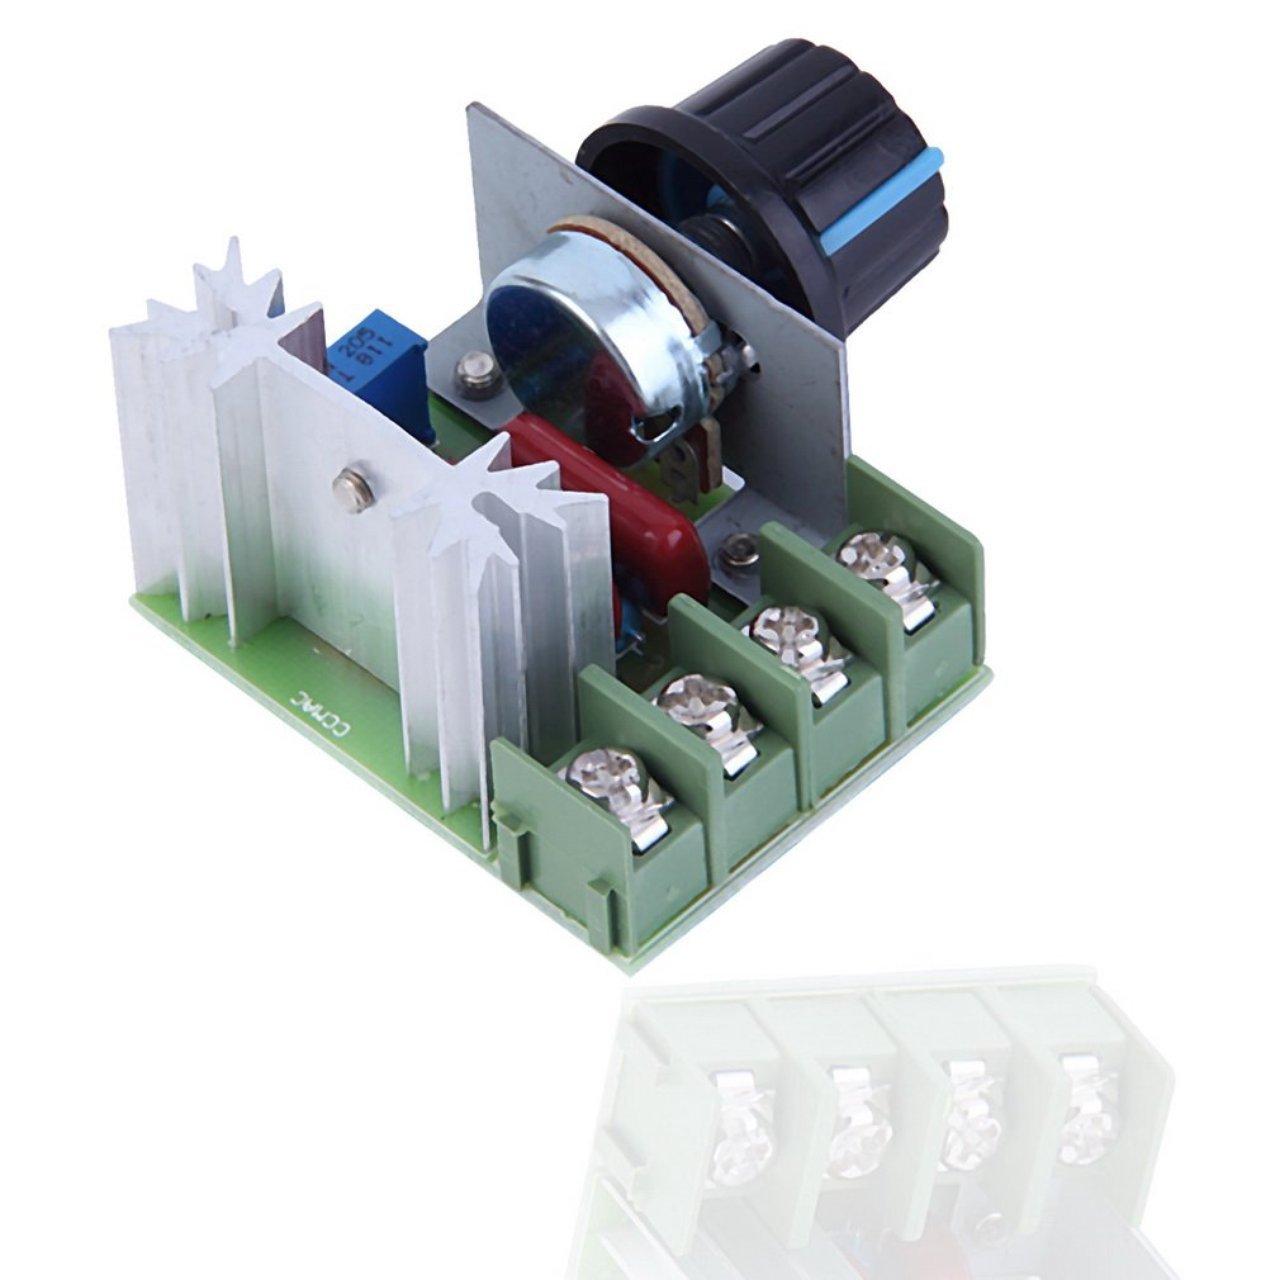 Footprintse; 2000 Watt AC 220 V SCR Spannungsregler Drehzahlregler Dimmer Thermostat